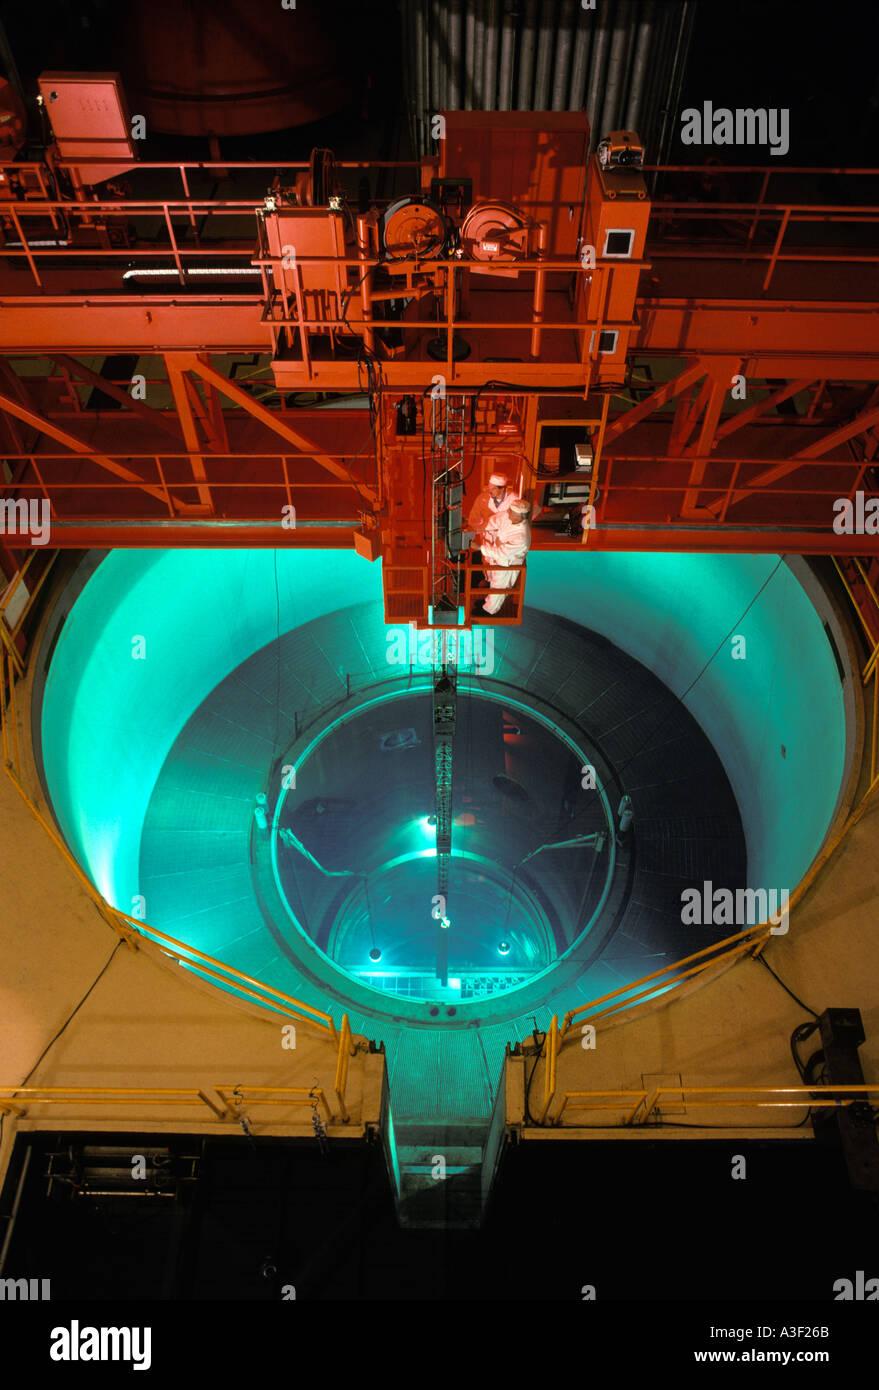 Boiling Water Reactor Stock Photos Power Plant Diagram Technicians Working Above Bwr San Jose California Image